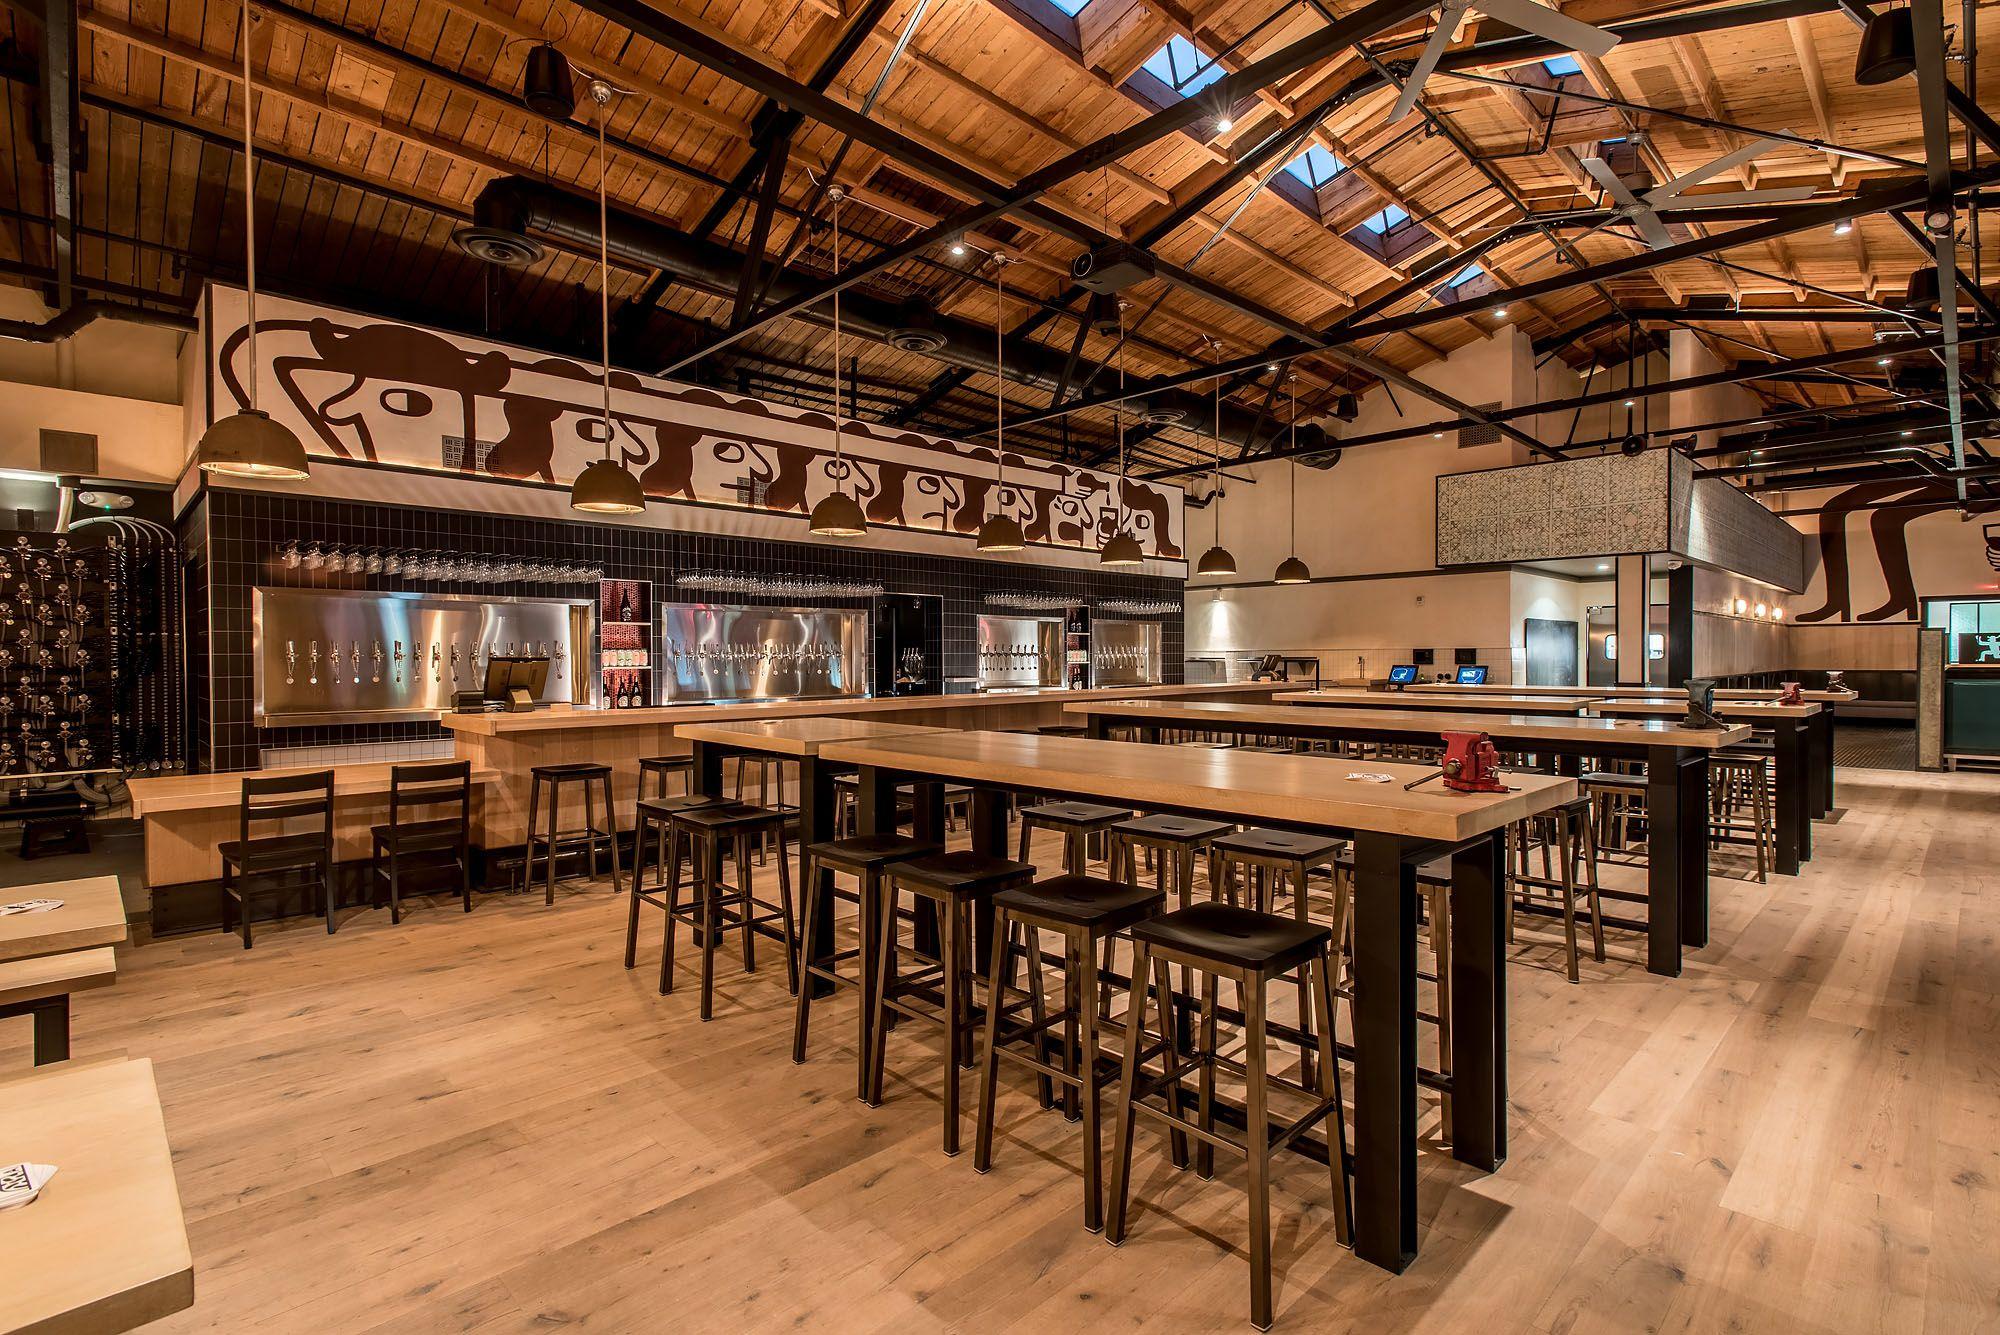 Mikkeller Bar Is A Downtown Drinking Game Changer Beer Bar Los Angeles Restaurants Craft Beer Bar